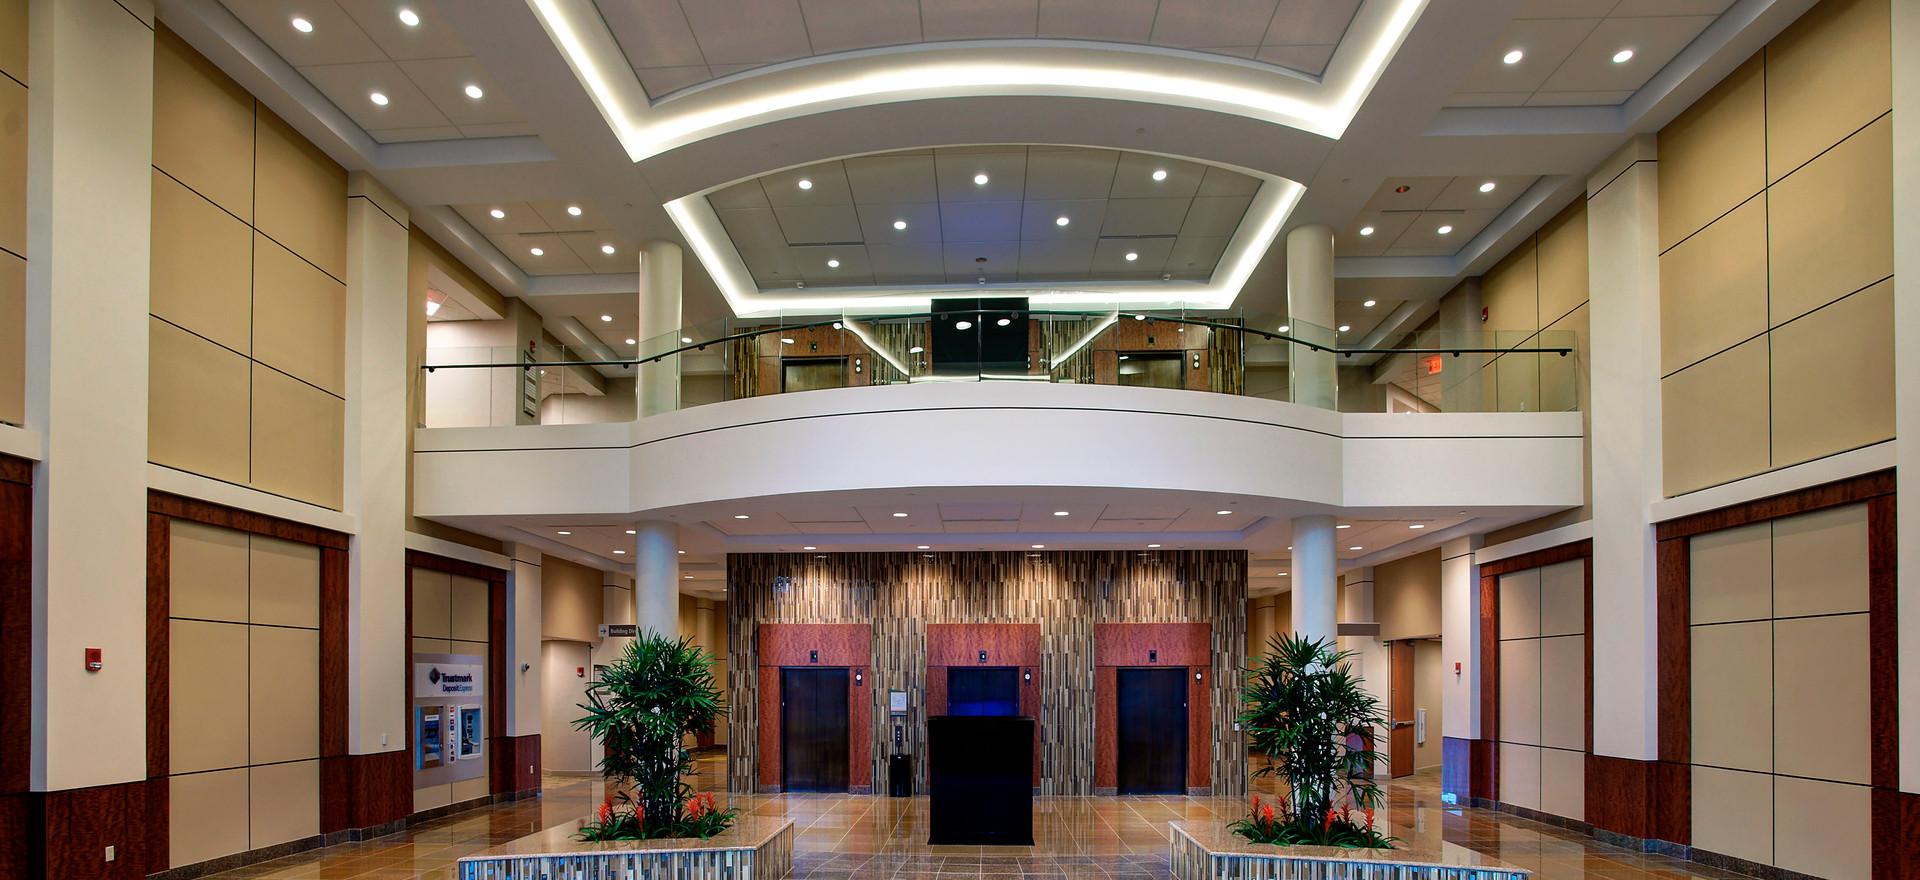 Medical Office Building Atrium Lighting